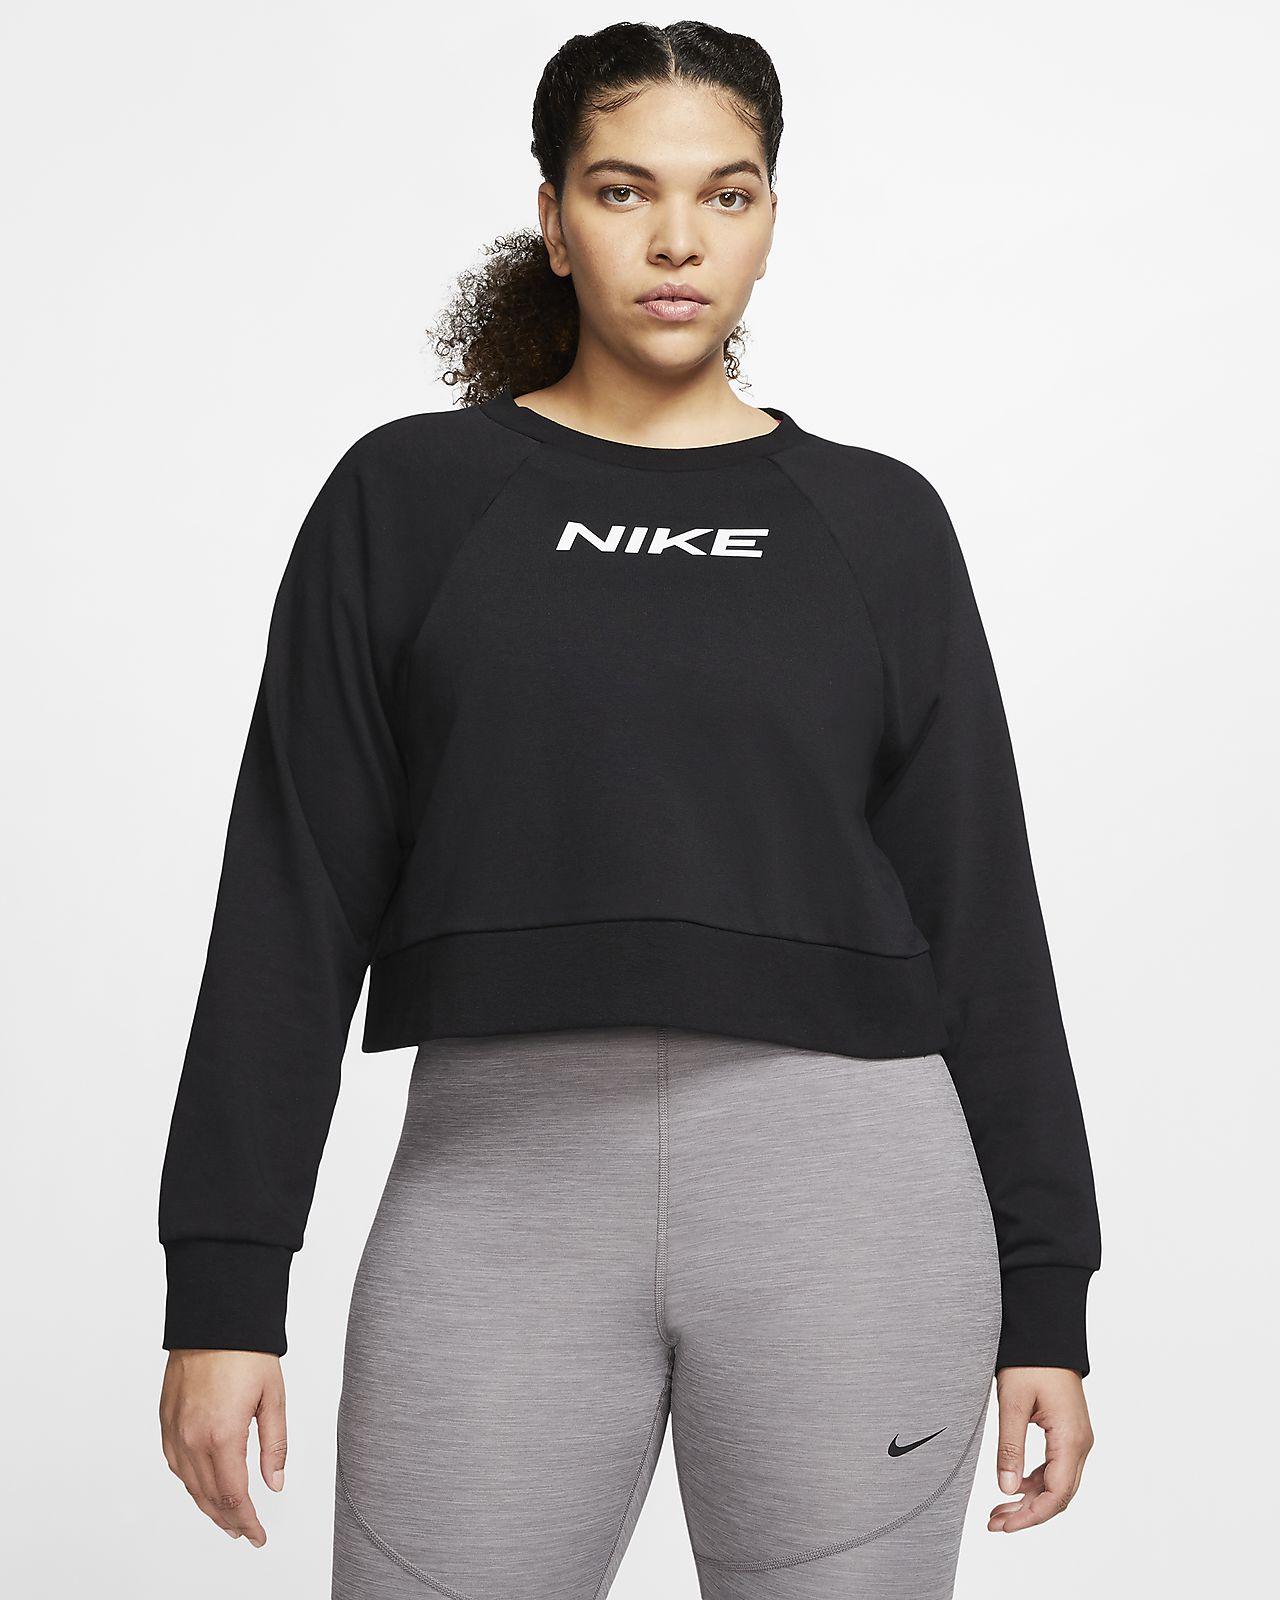 Damska bluza treningowa Nike (duże rozmiary)